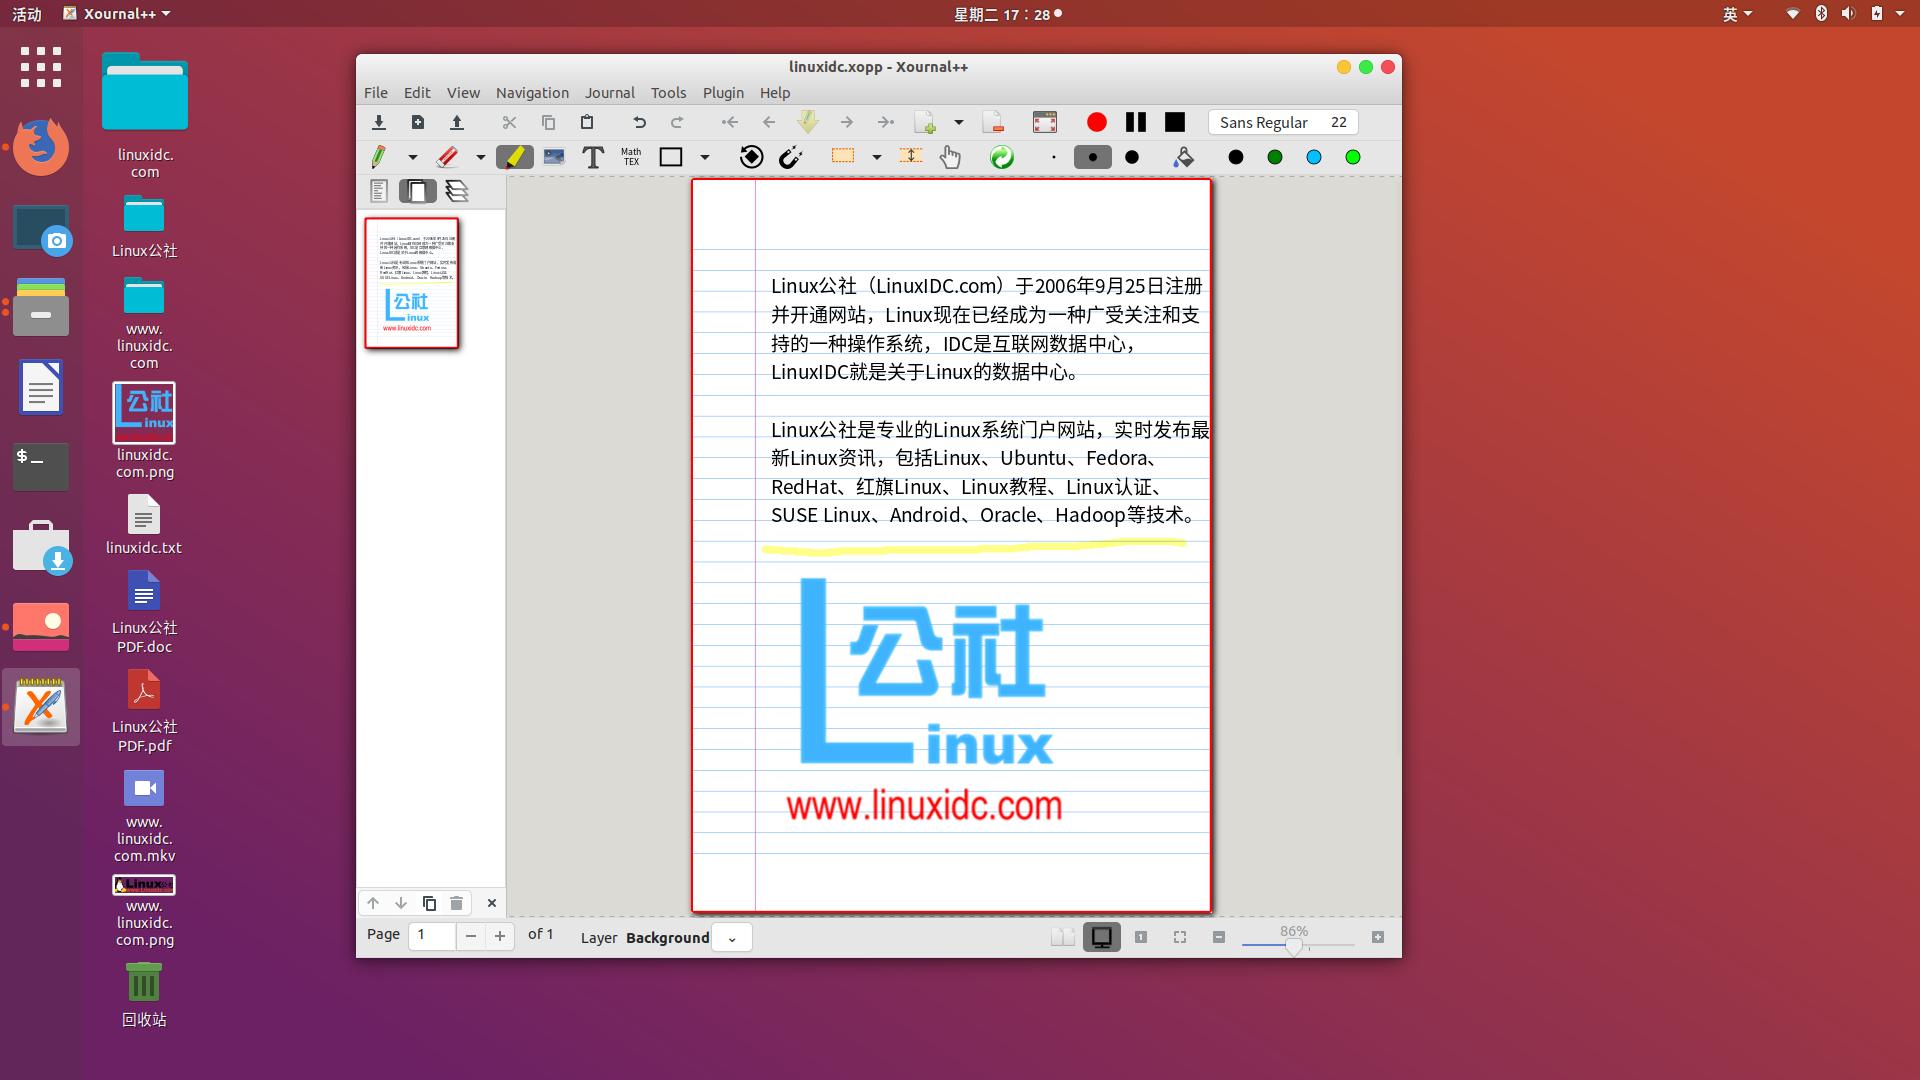 Xournal++ 1.0.5 发布,如何在Ubuntu中安装